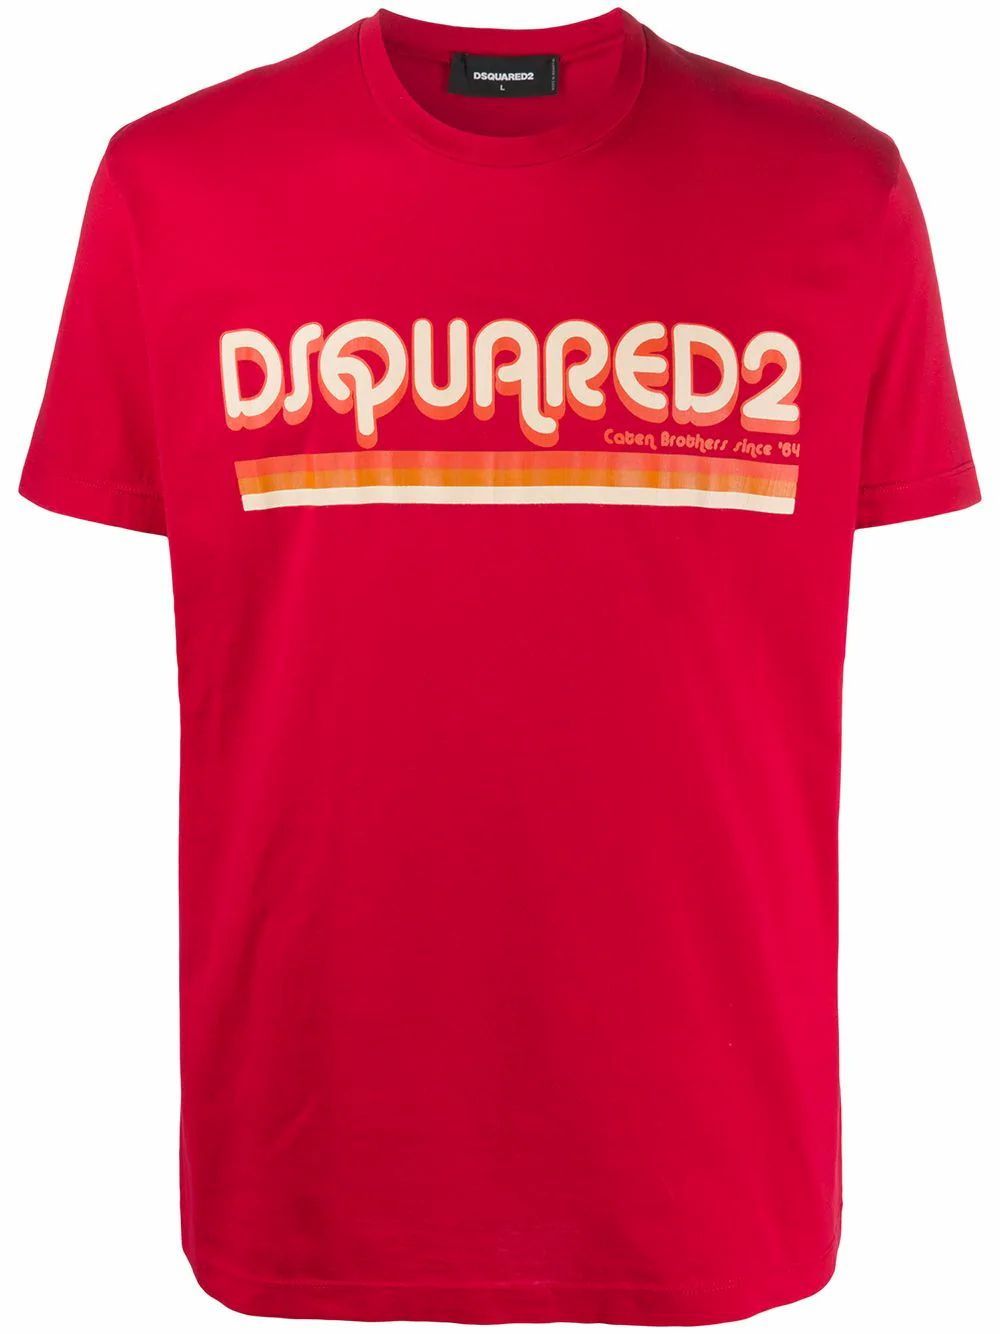 Dsquared2 Cottons DSQUARED2 MEN'S RED COTTON T-SHIRT